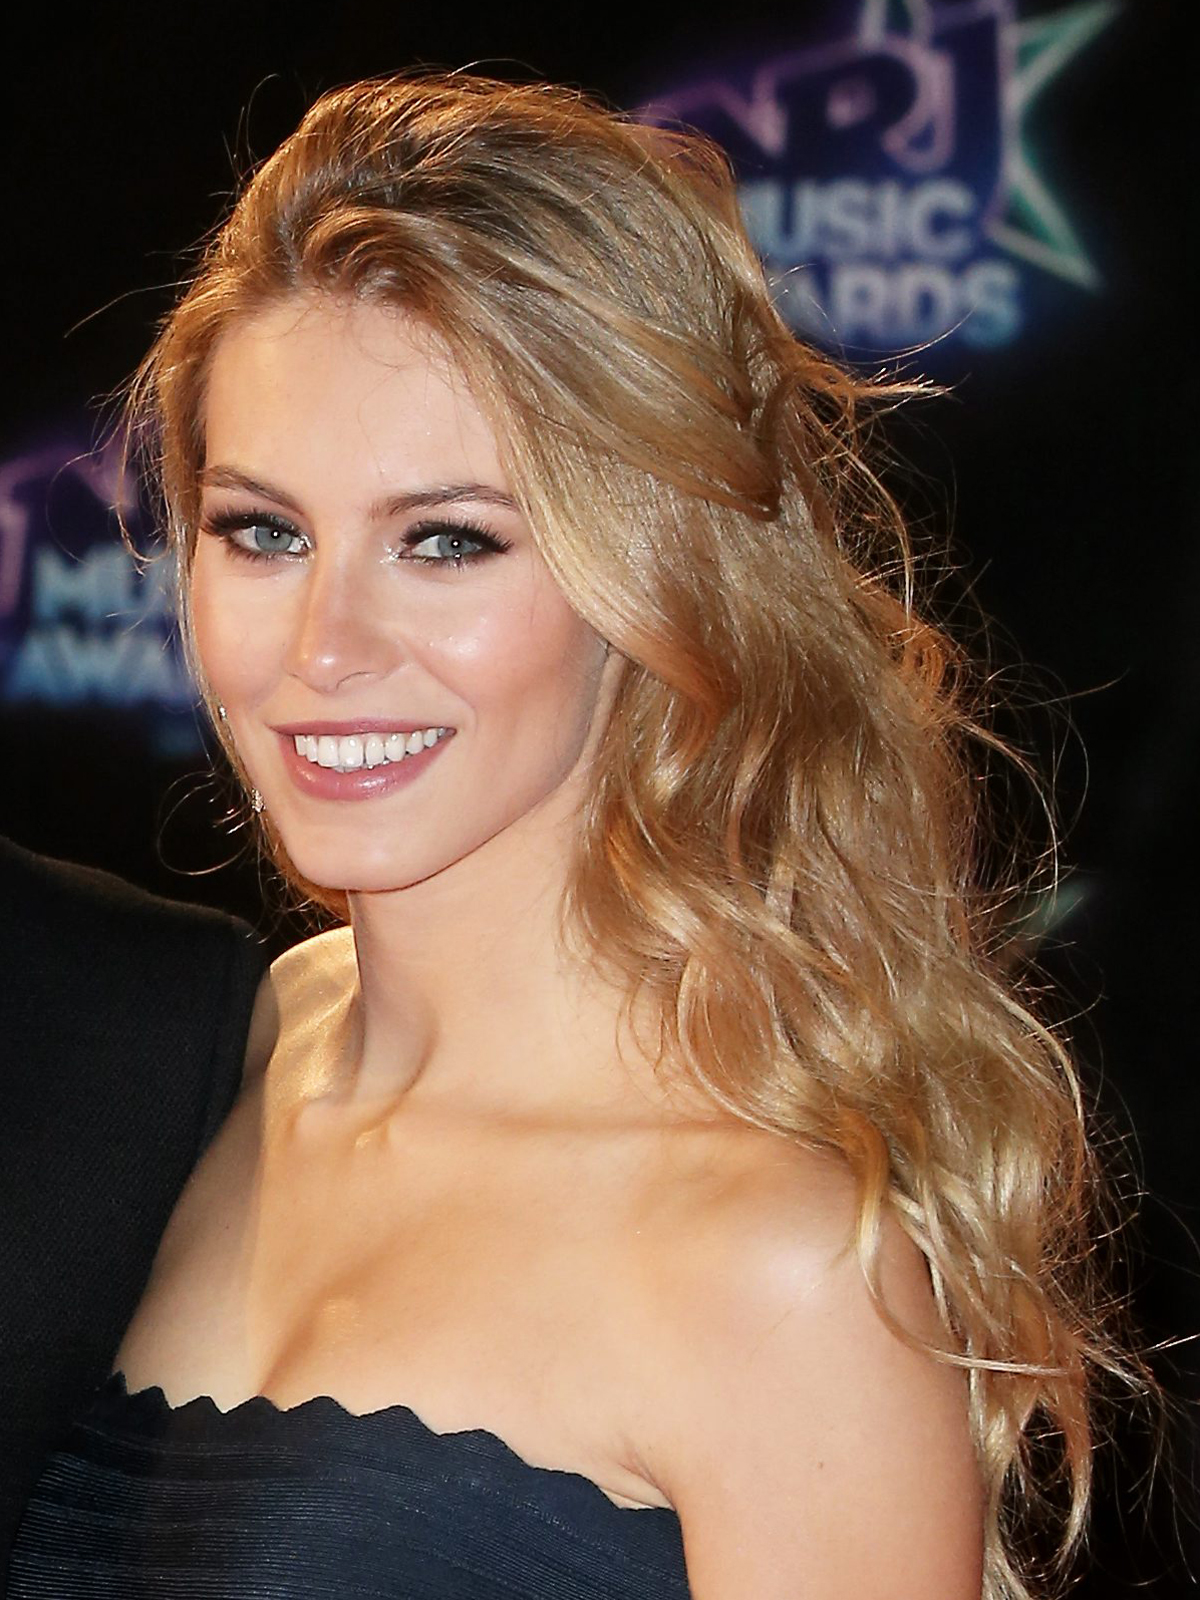 Alicia Endemann